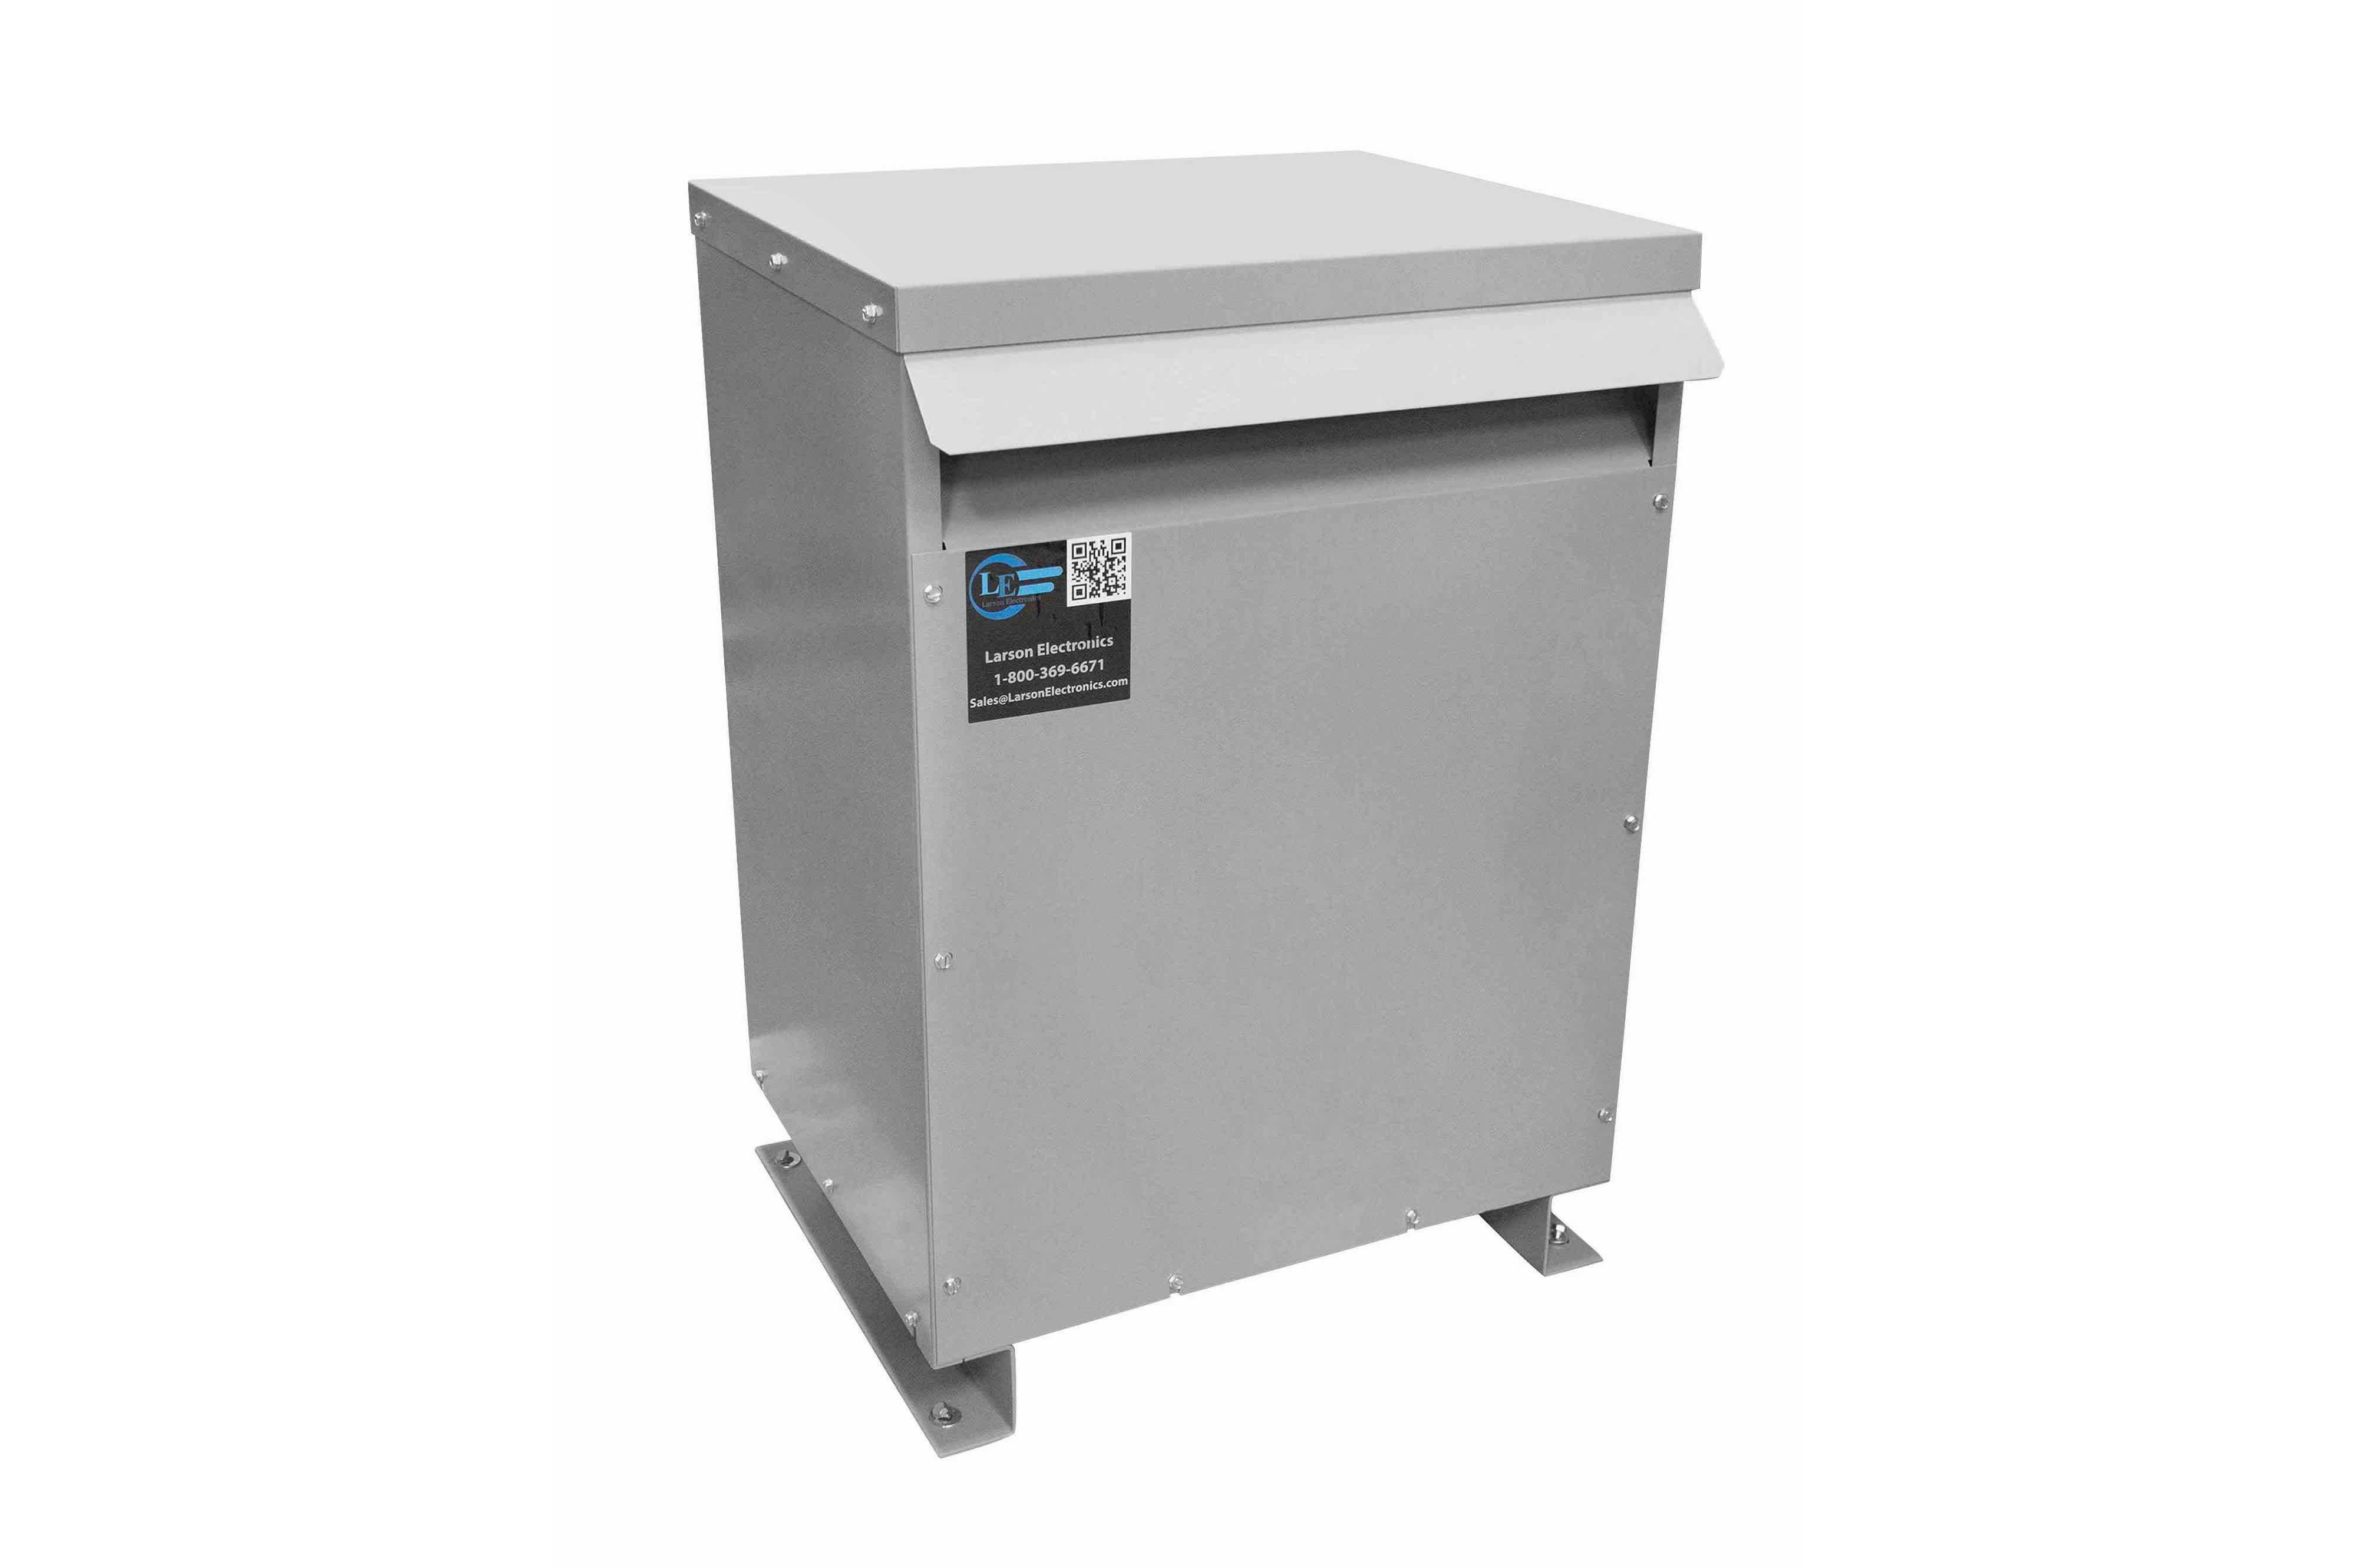 35 kVA 3PH Isolation Transformer, 240V Wye Primary, 380Y/220 Wye-N Secondary, N3R, Ventilated, 60 Hz